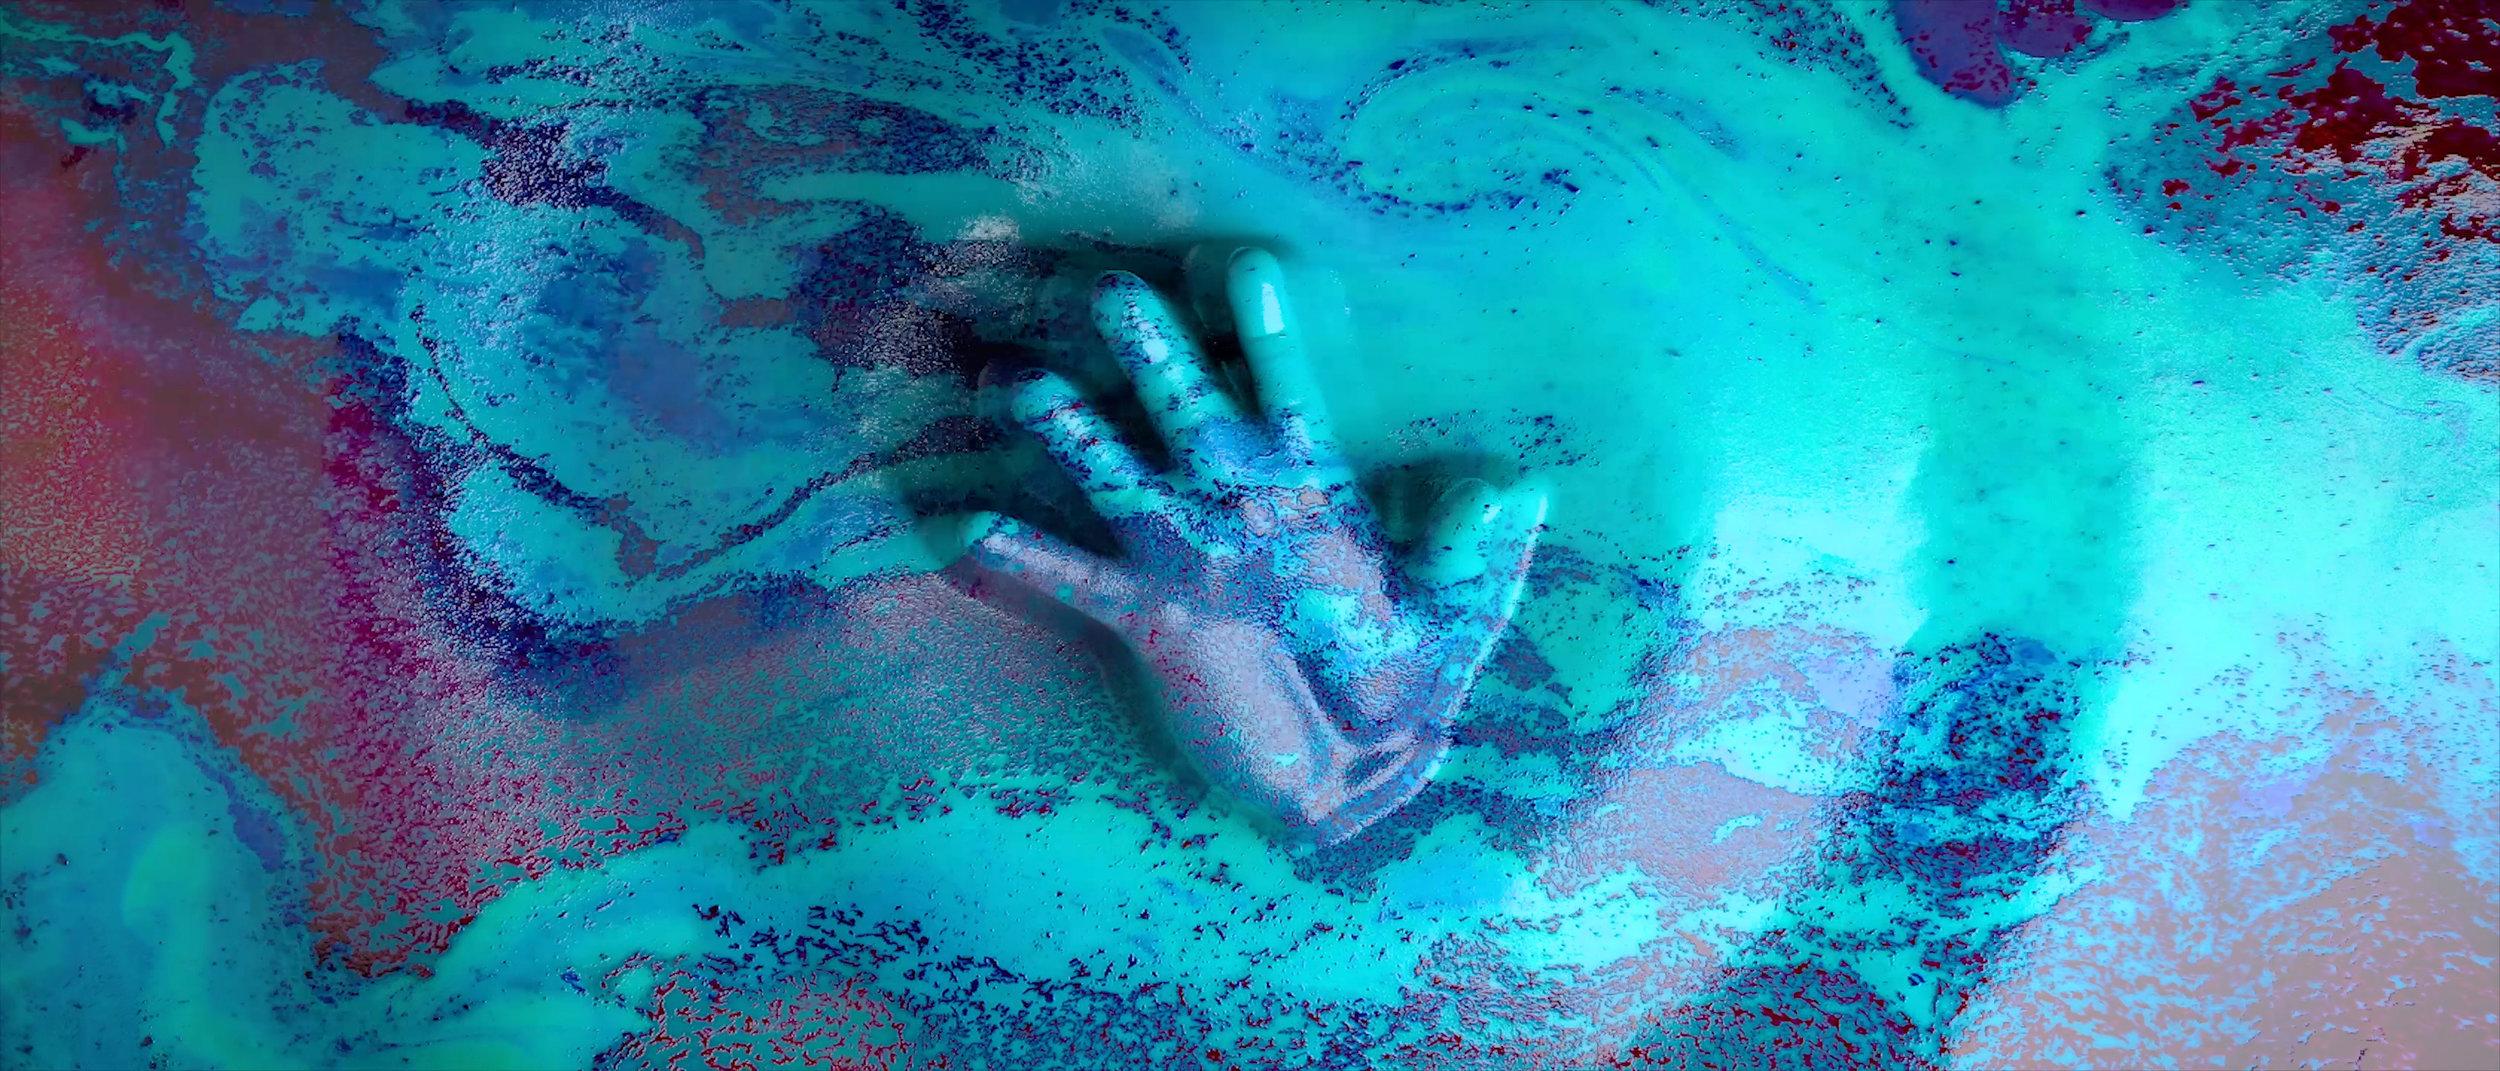 FINAL HANDS SOUND (0-00-02-06).jpg